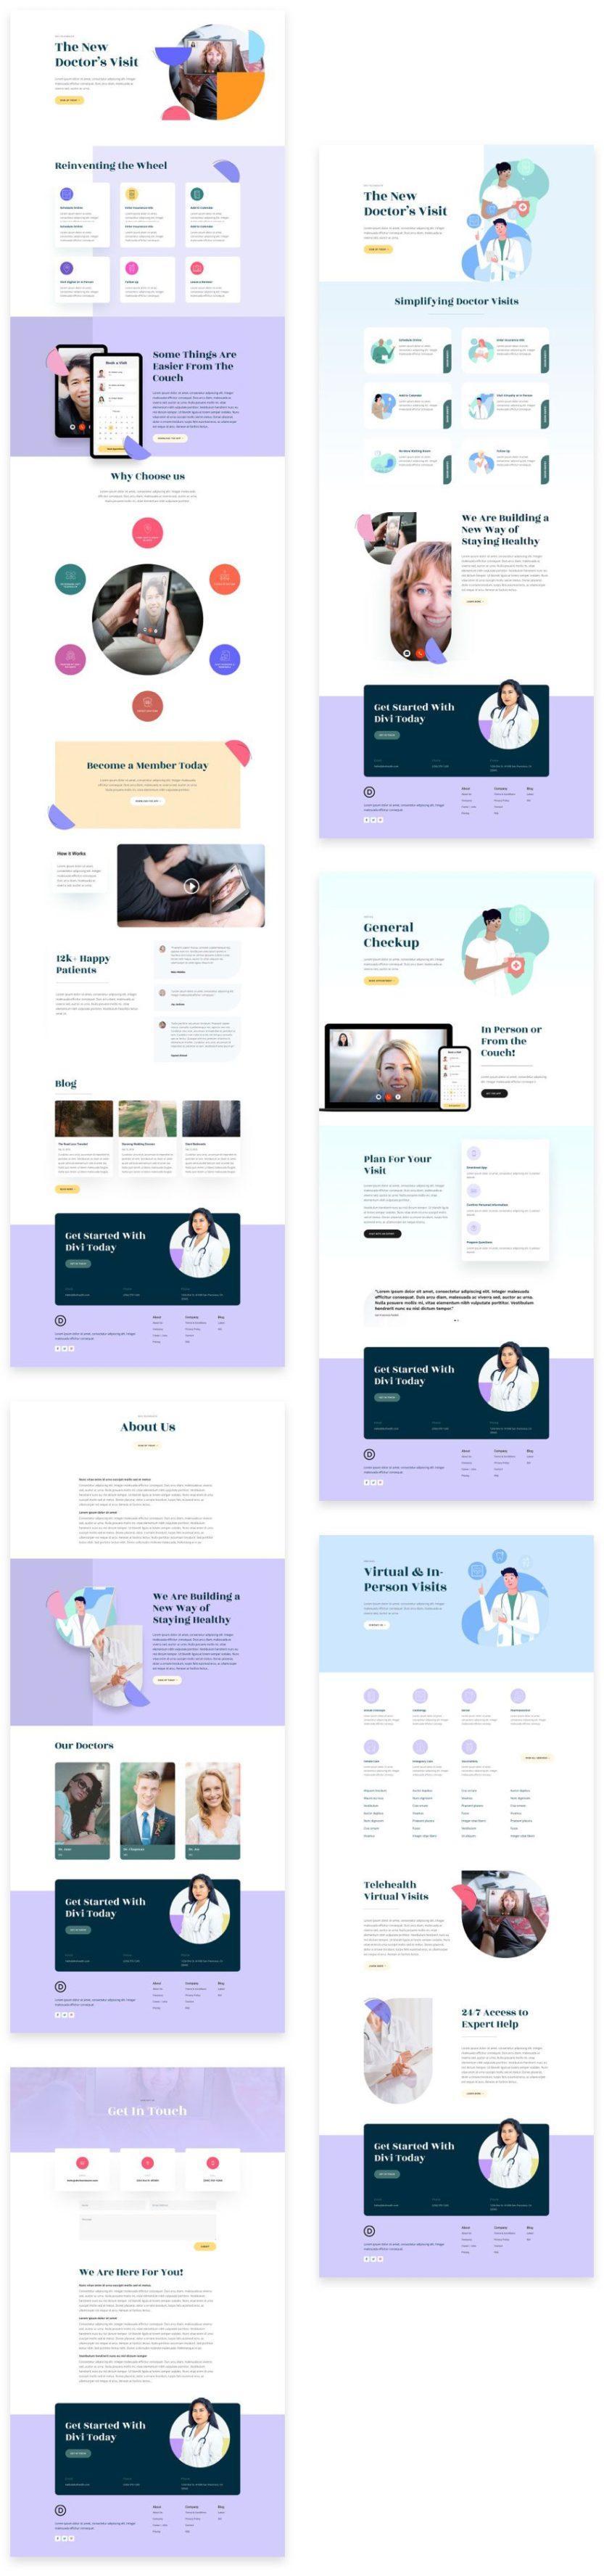 telehealth website